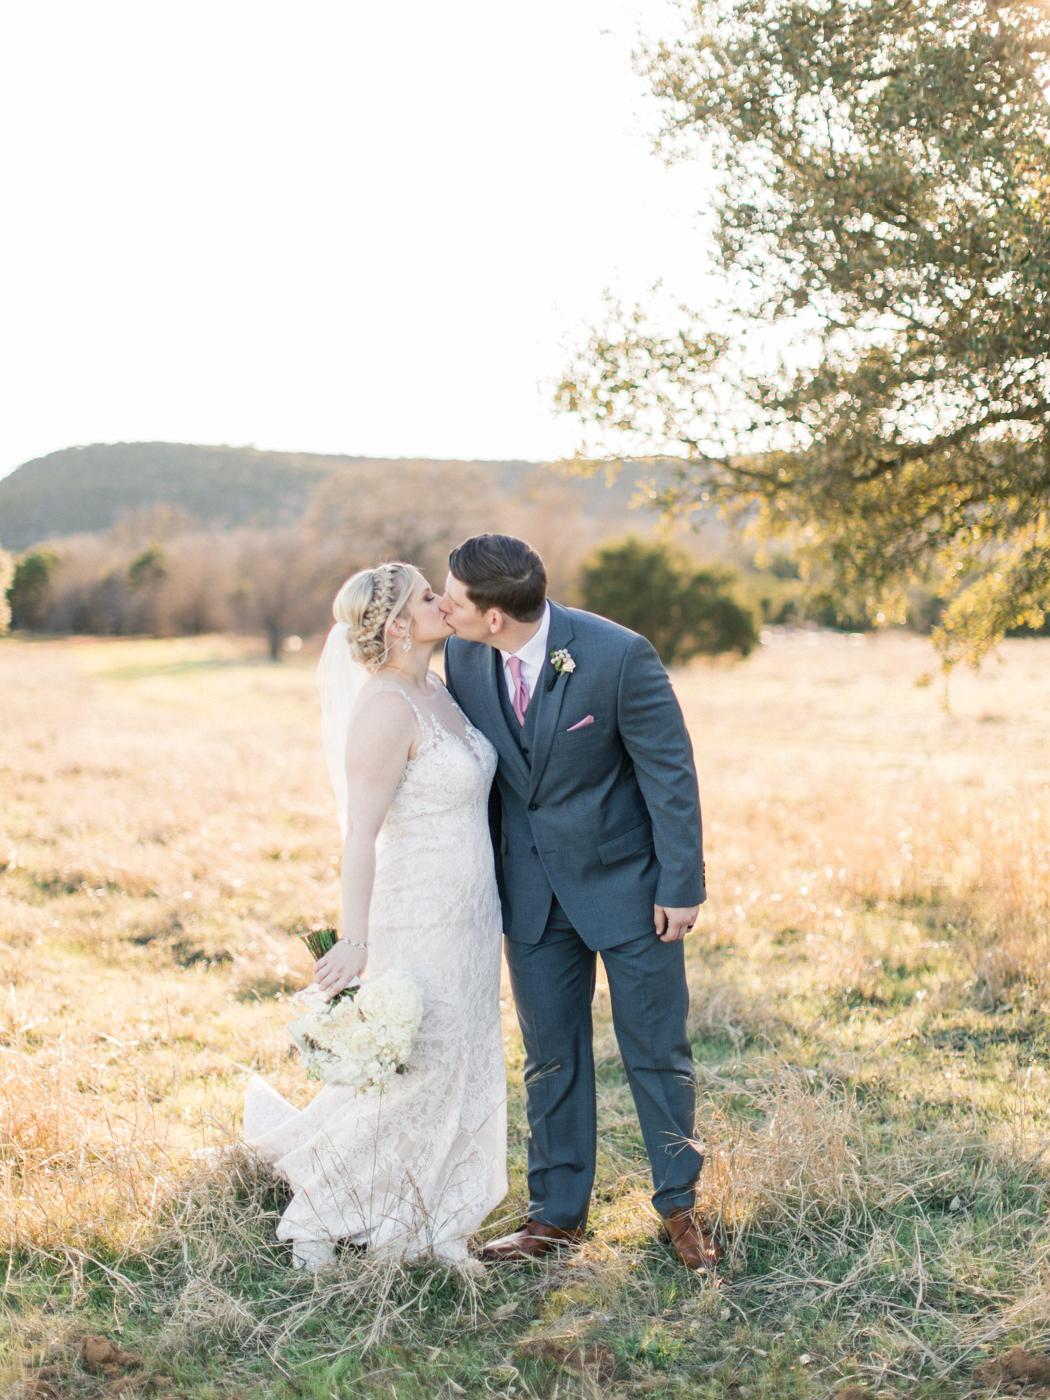 The Barn at Sparrow Creek Ranch Wedding Photos - Natural Light Photography